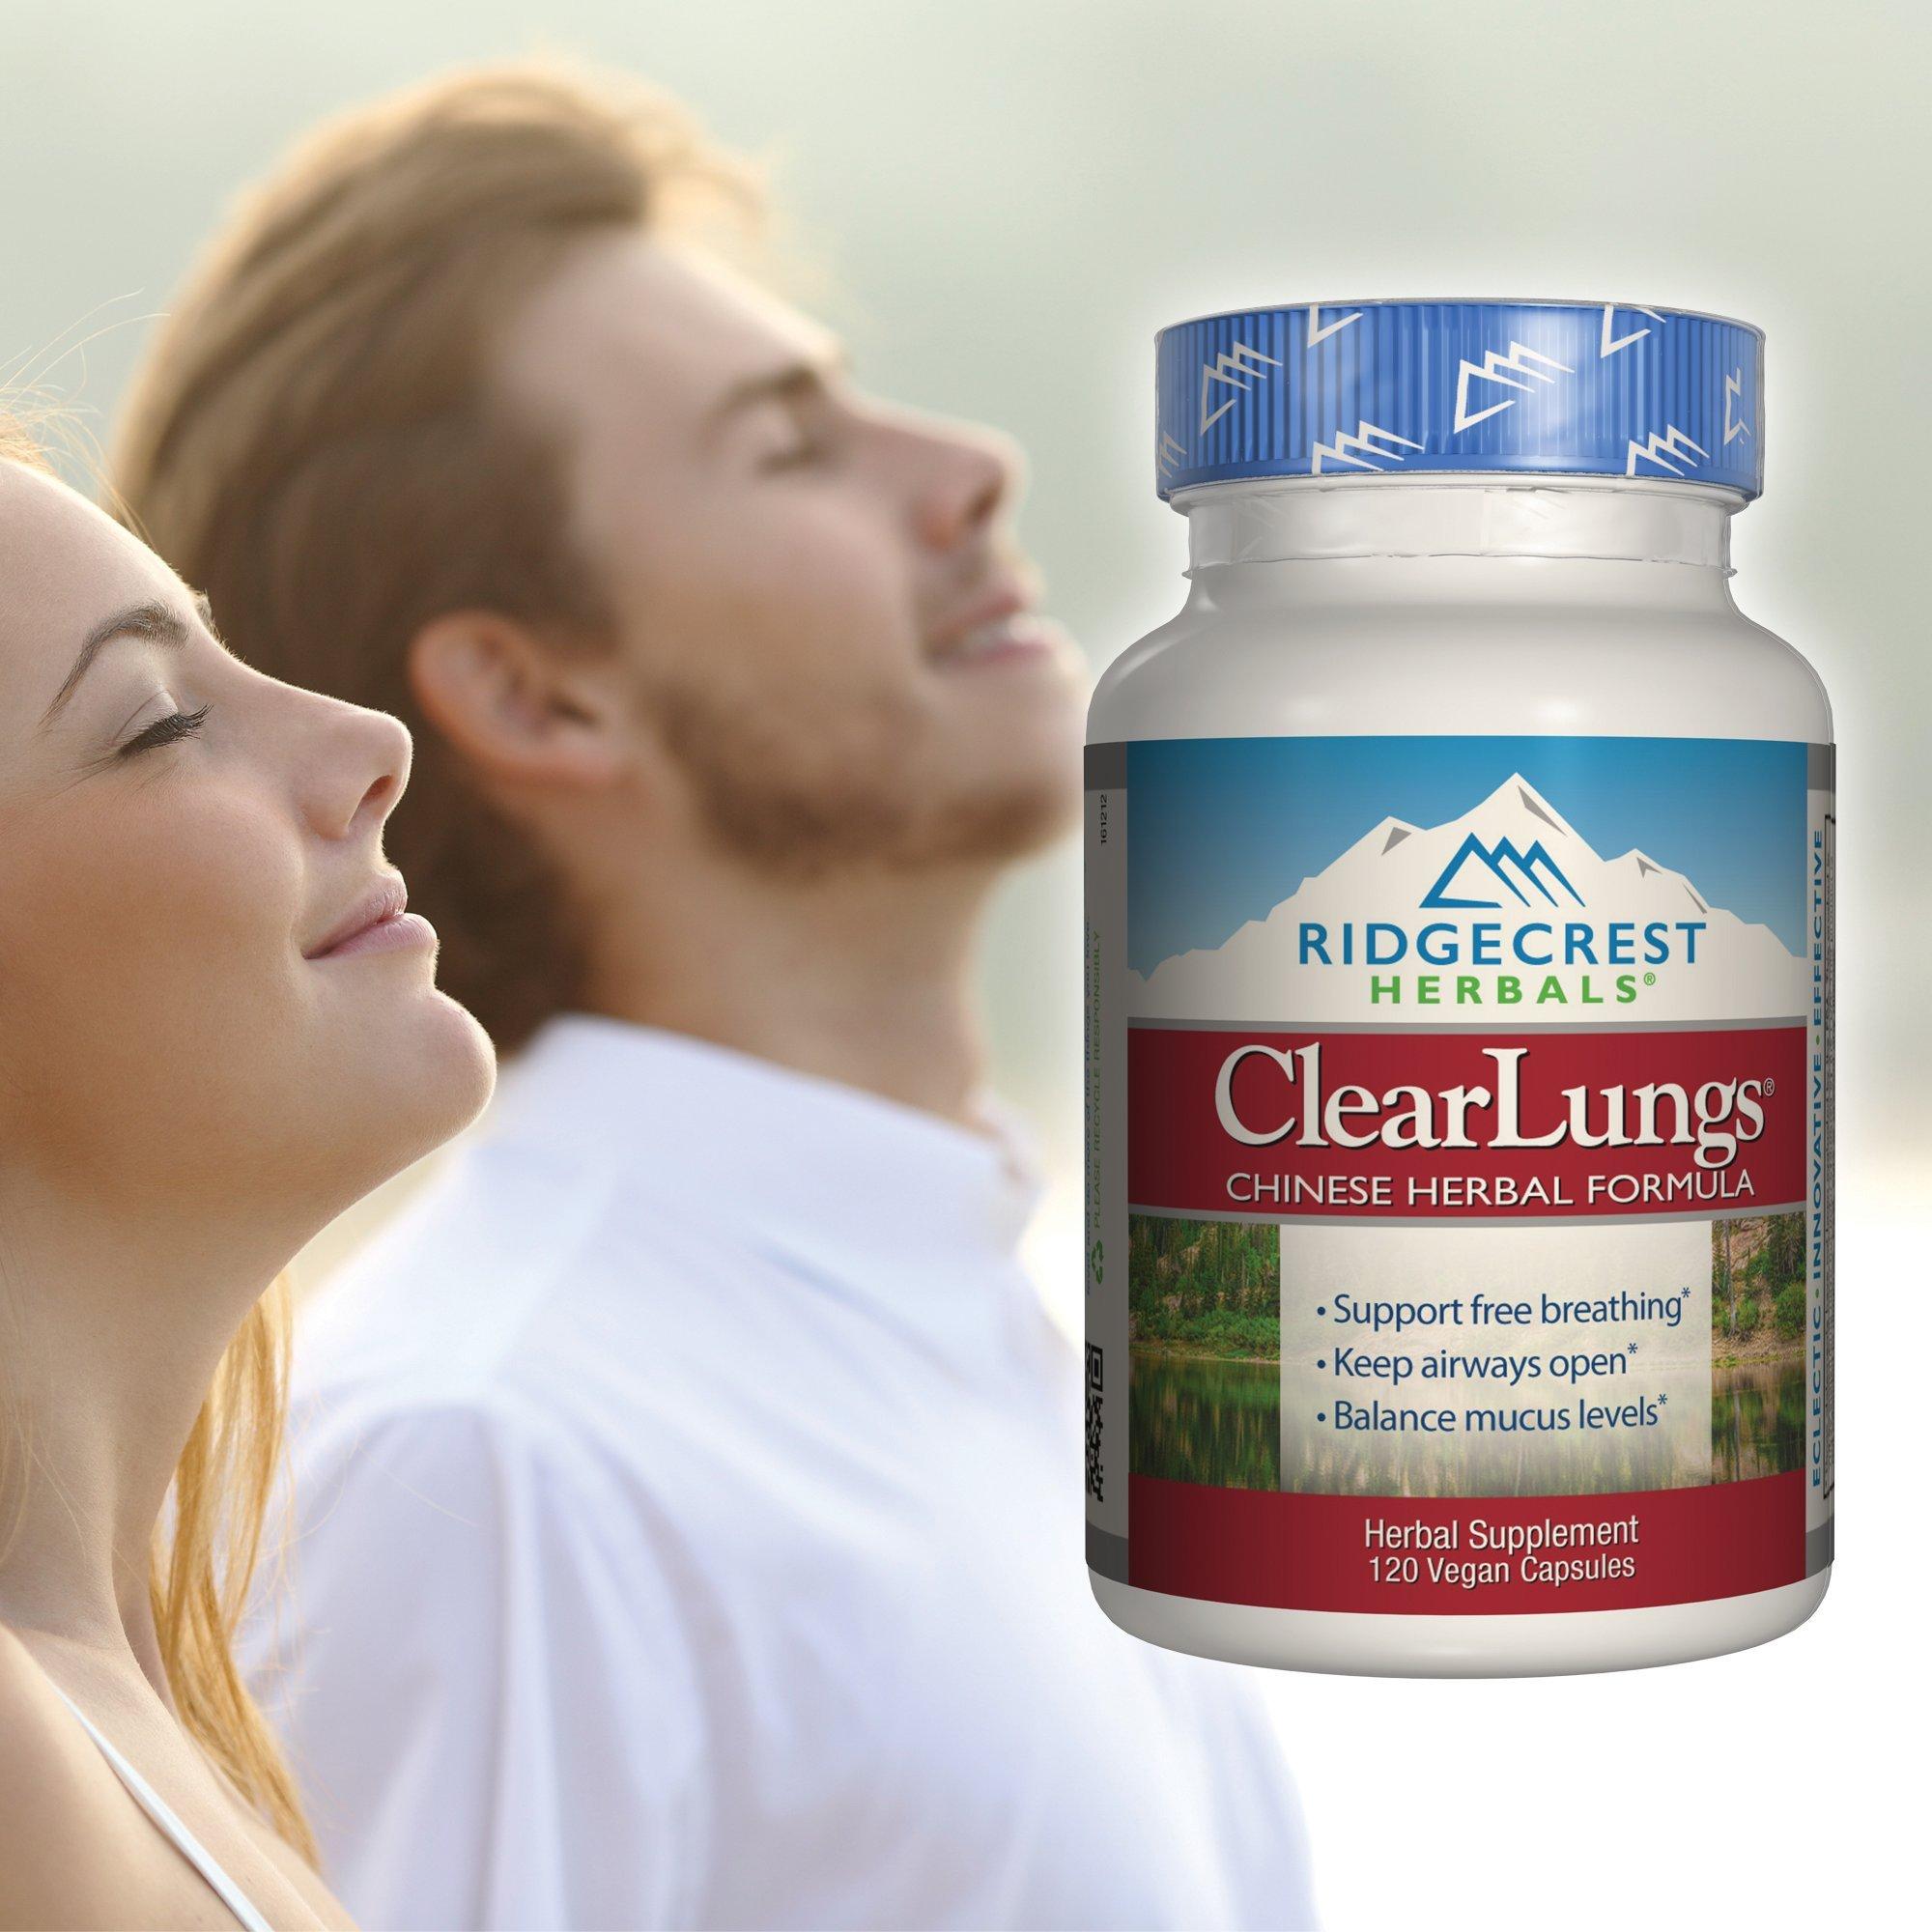 Ridgecrest Herbals ClearLungs, Chinese Herbal Formula, 120 Vegetarian Capsules by Ridgecrest Herbals